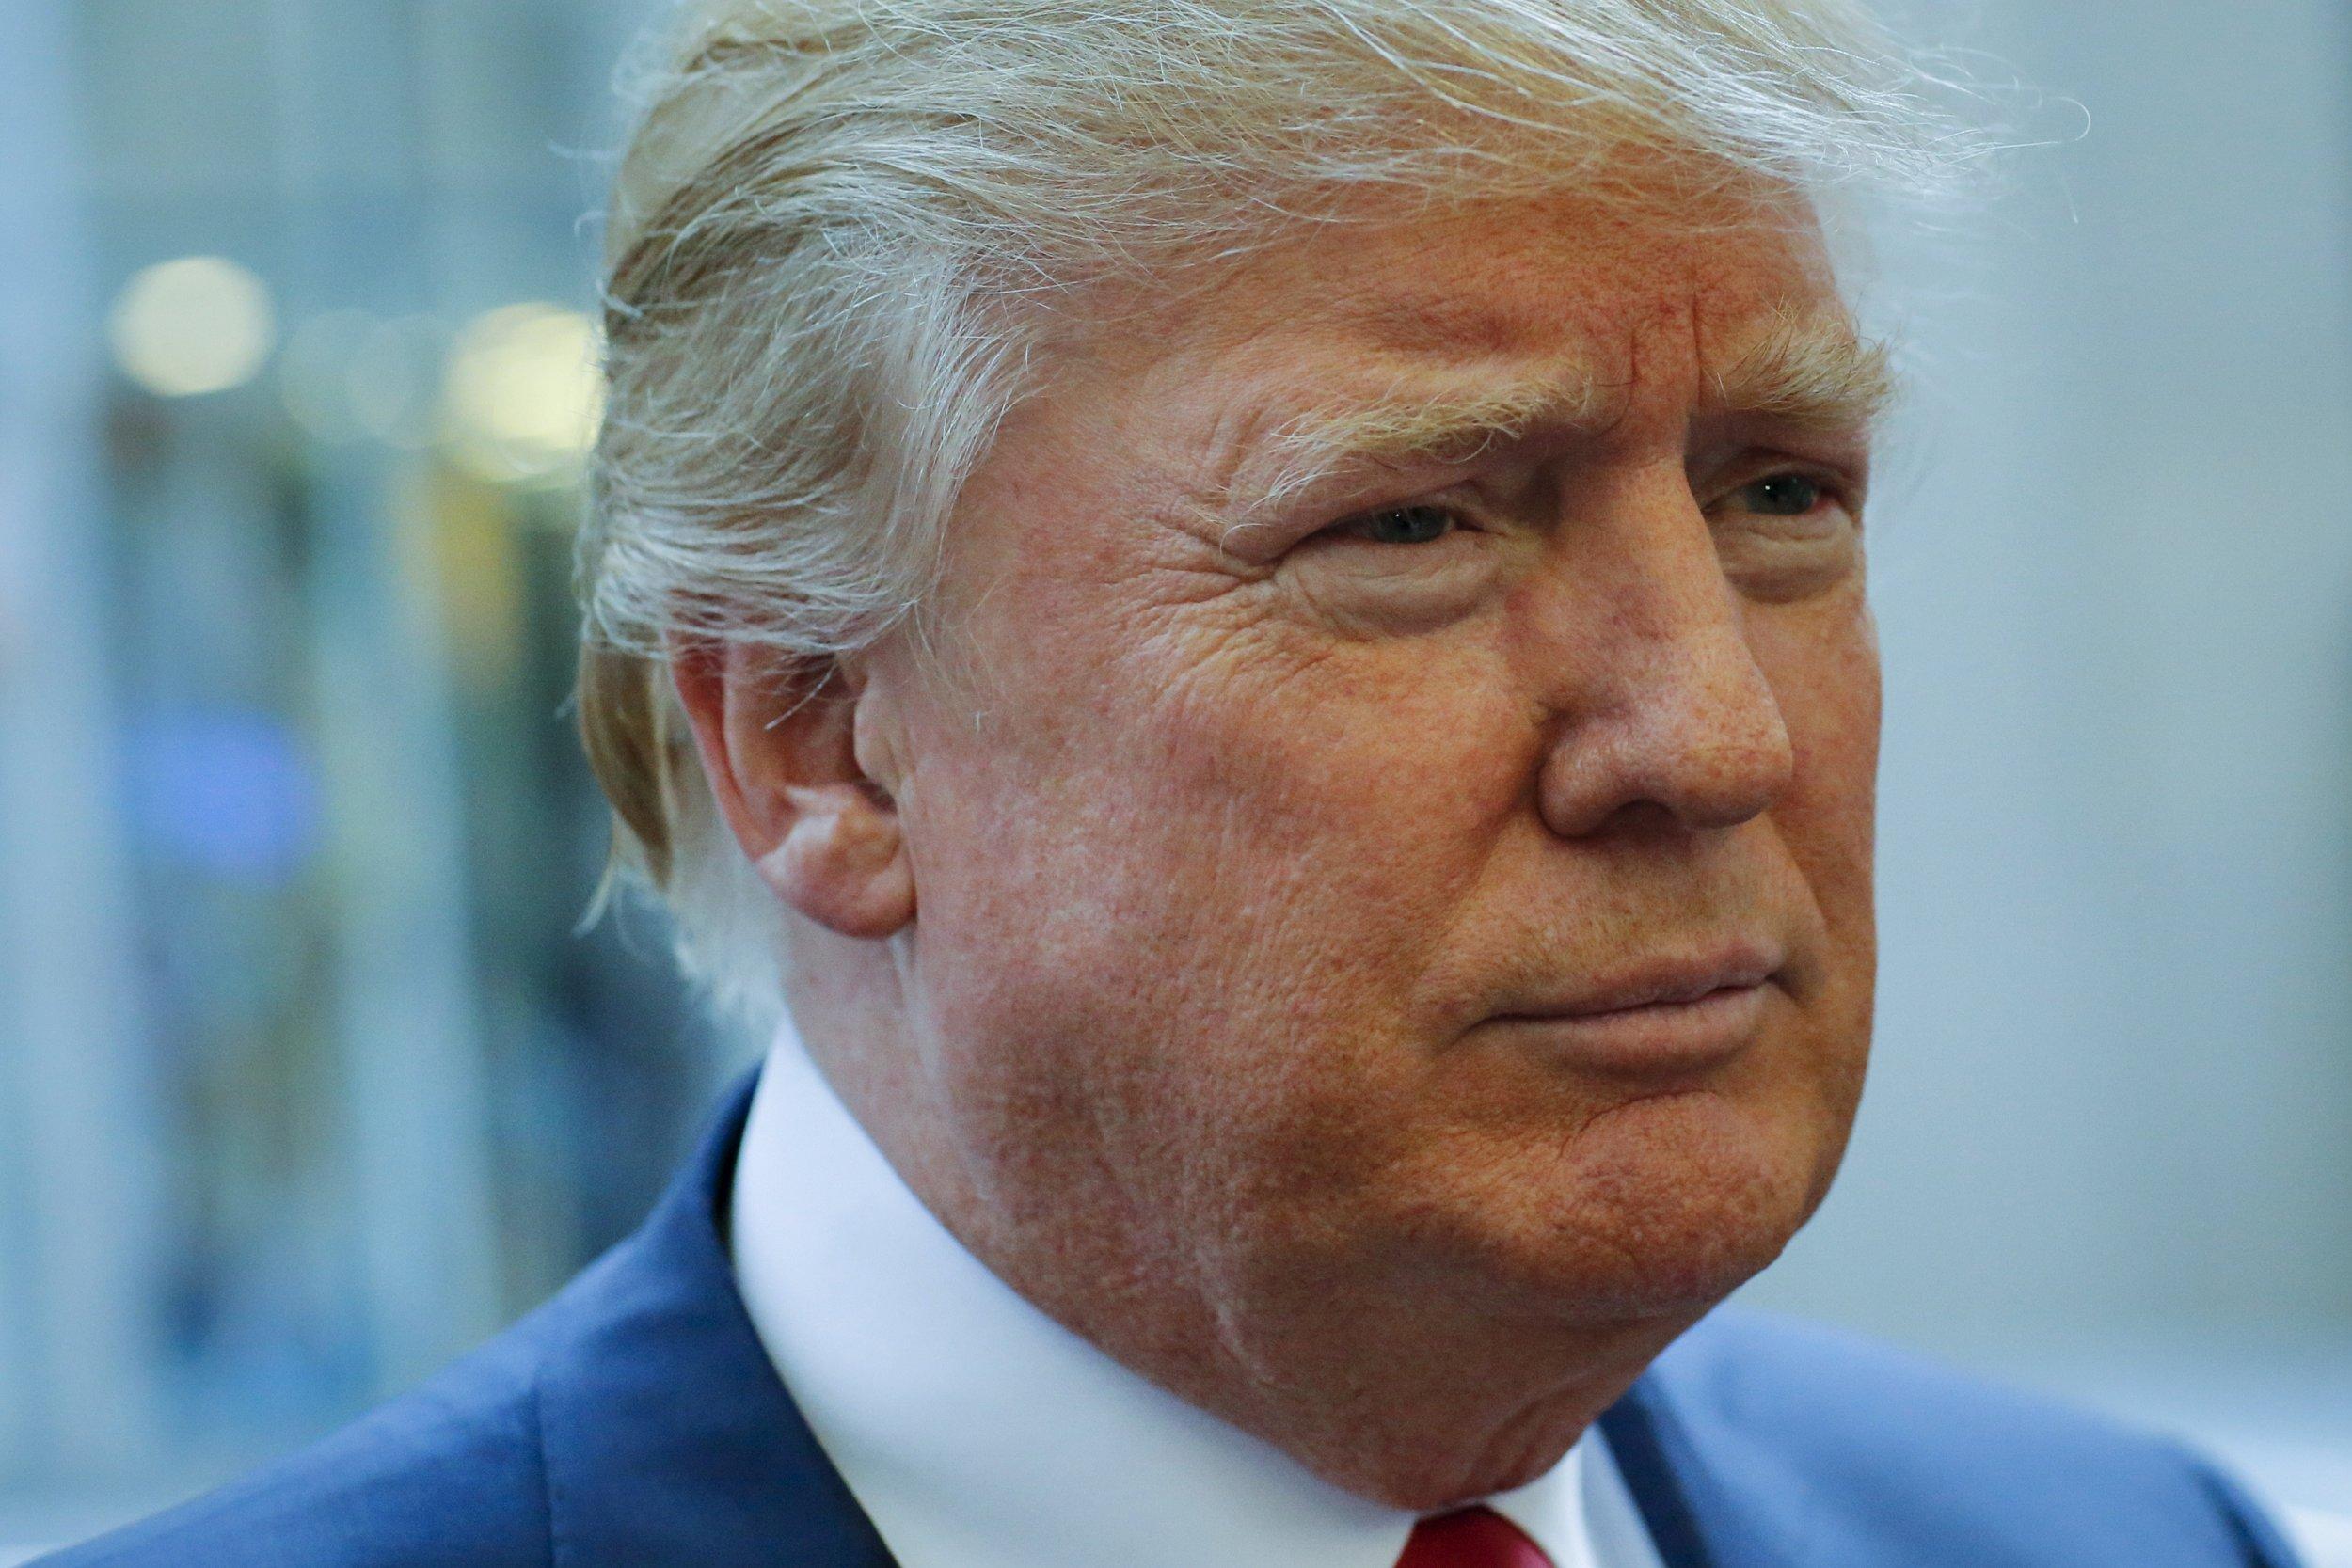 0912_Donald_Trump_Twitter_01